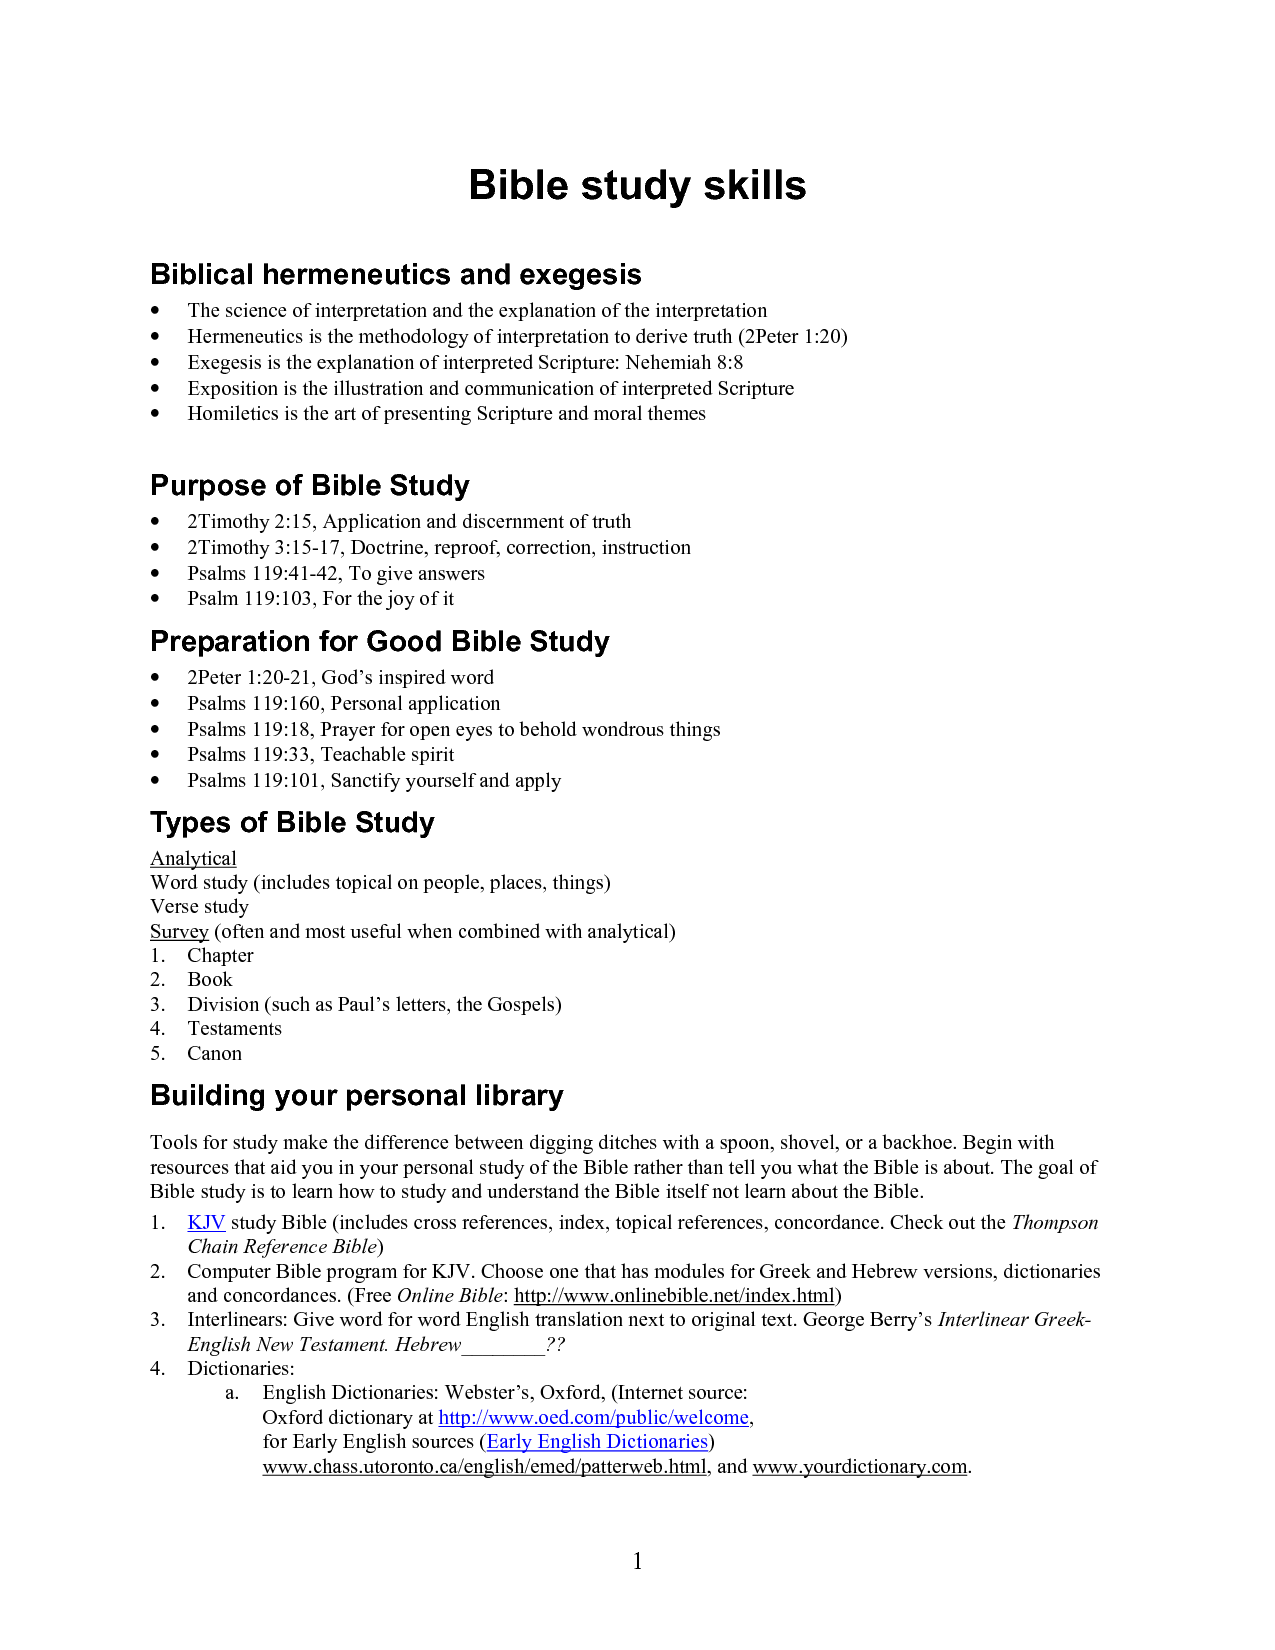 Bible study worksheets free